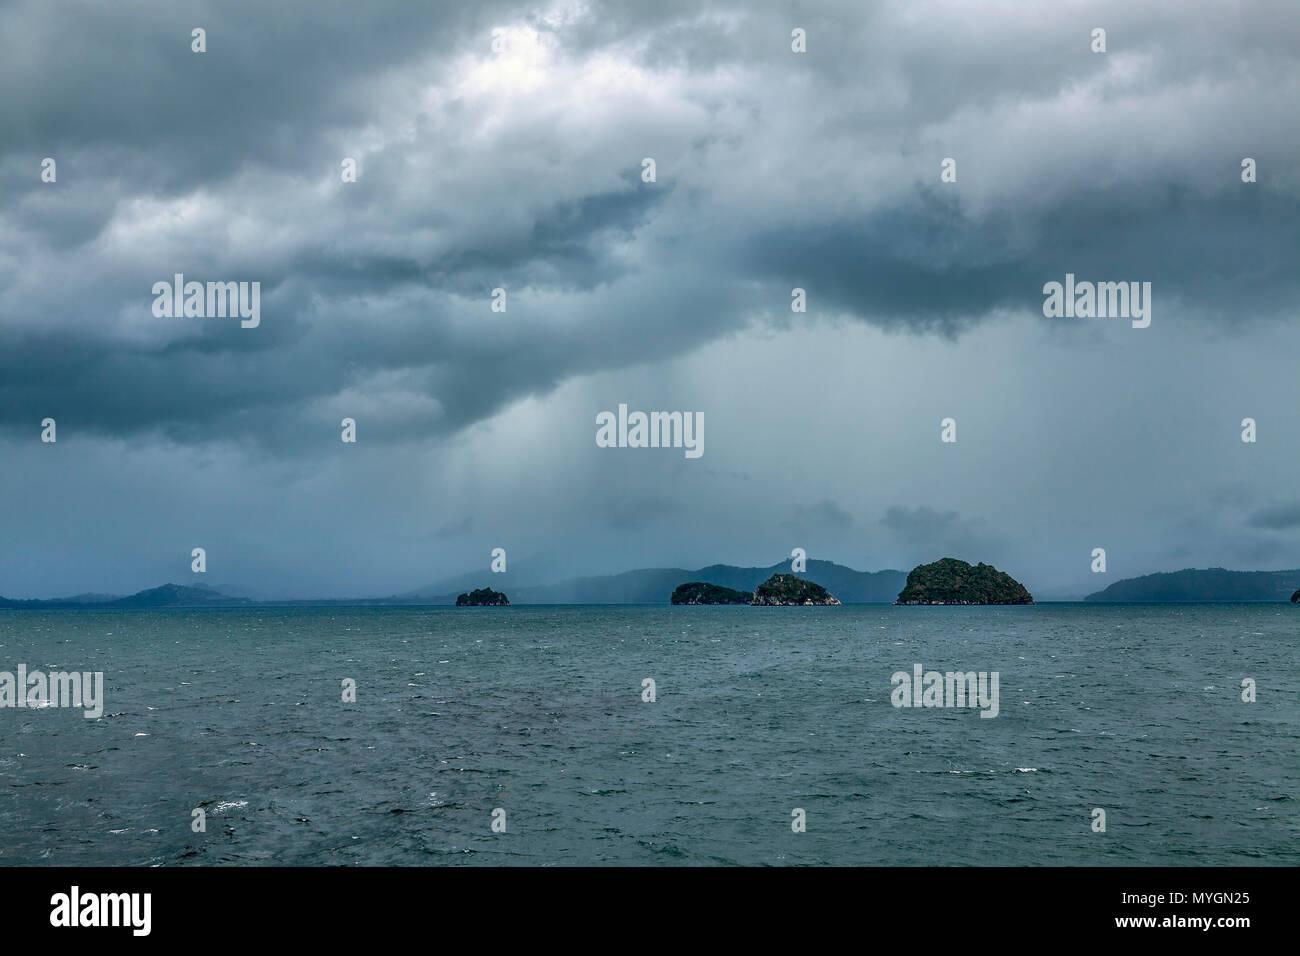 The rainy season on Koh Samui in Thailand - Stock Image